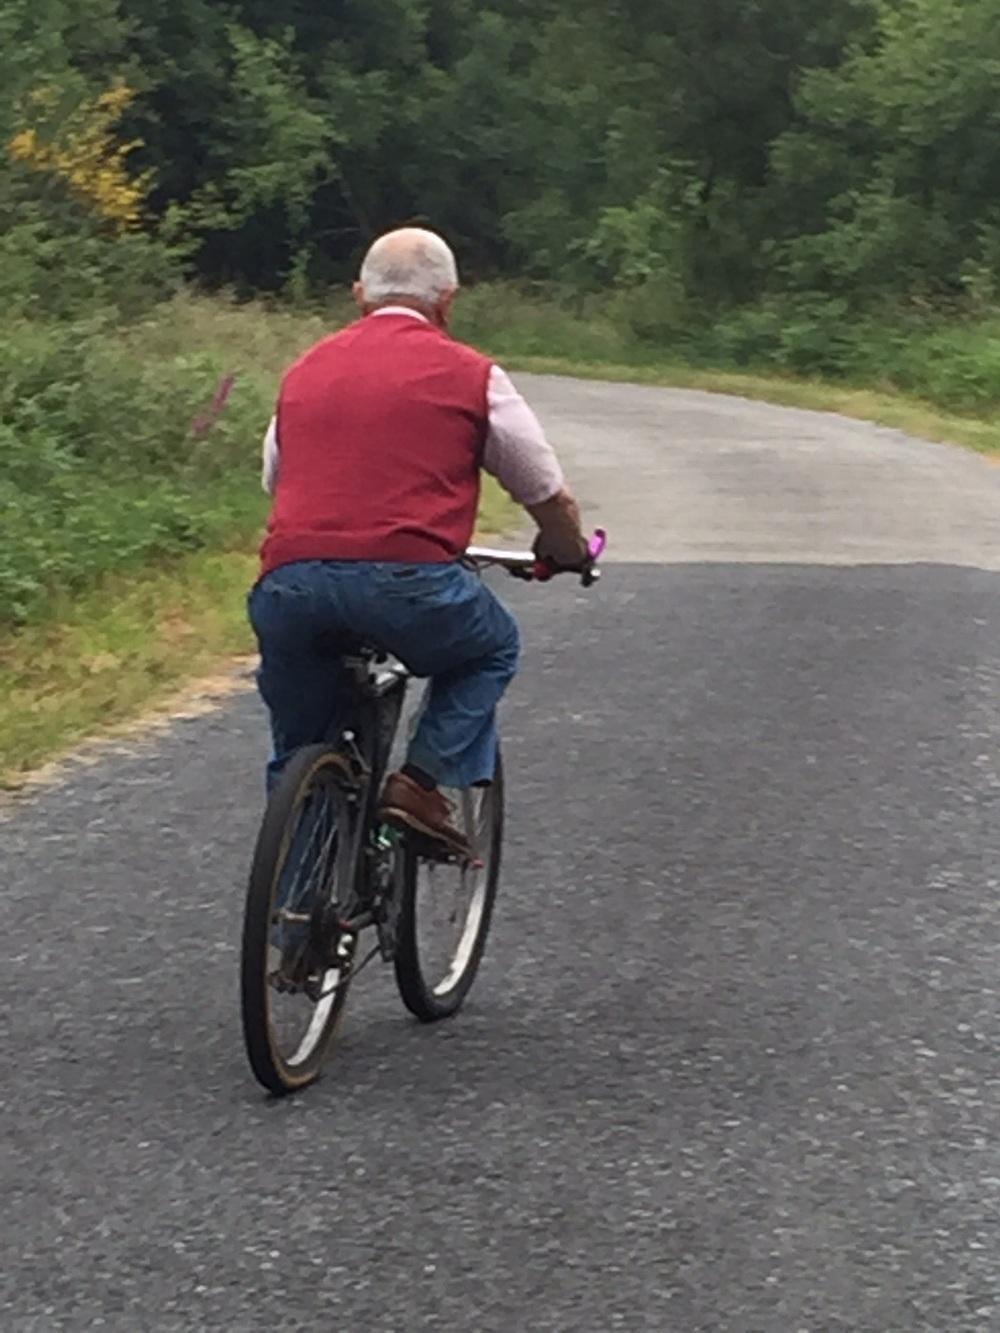 Bicycling through life